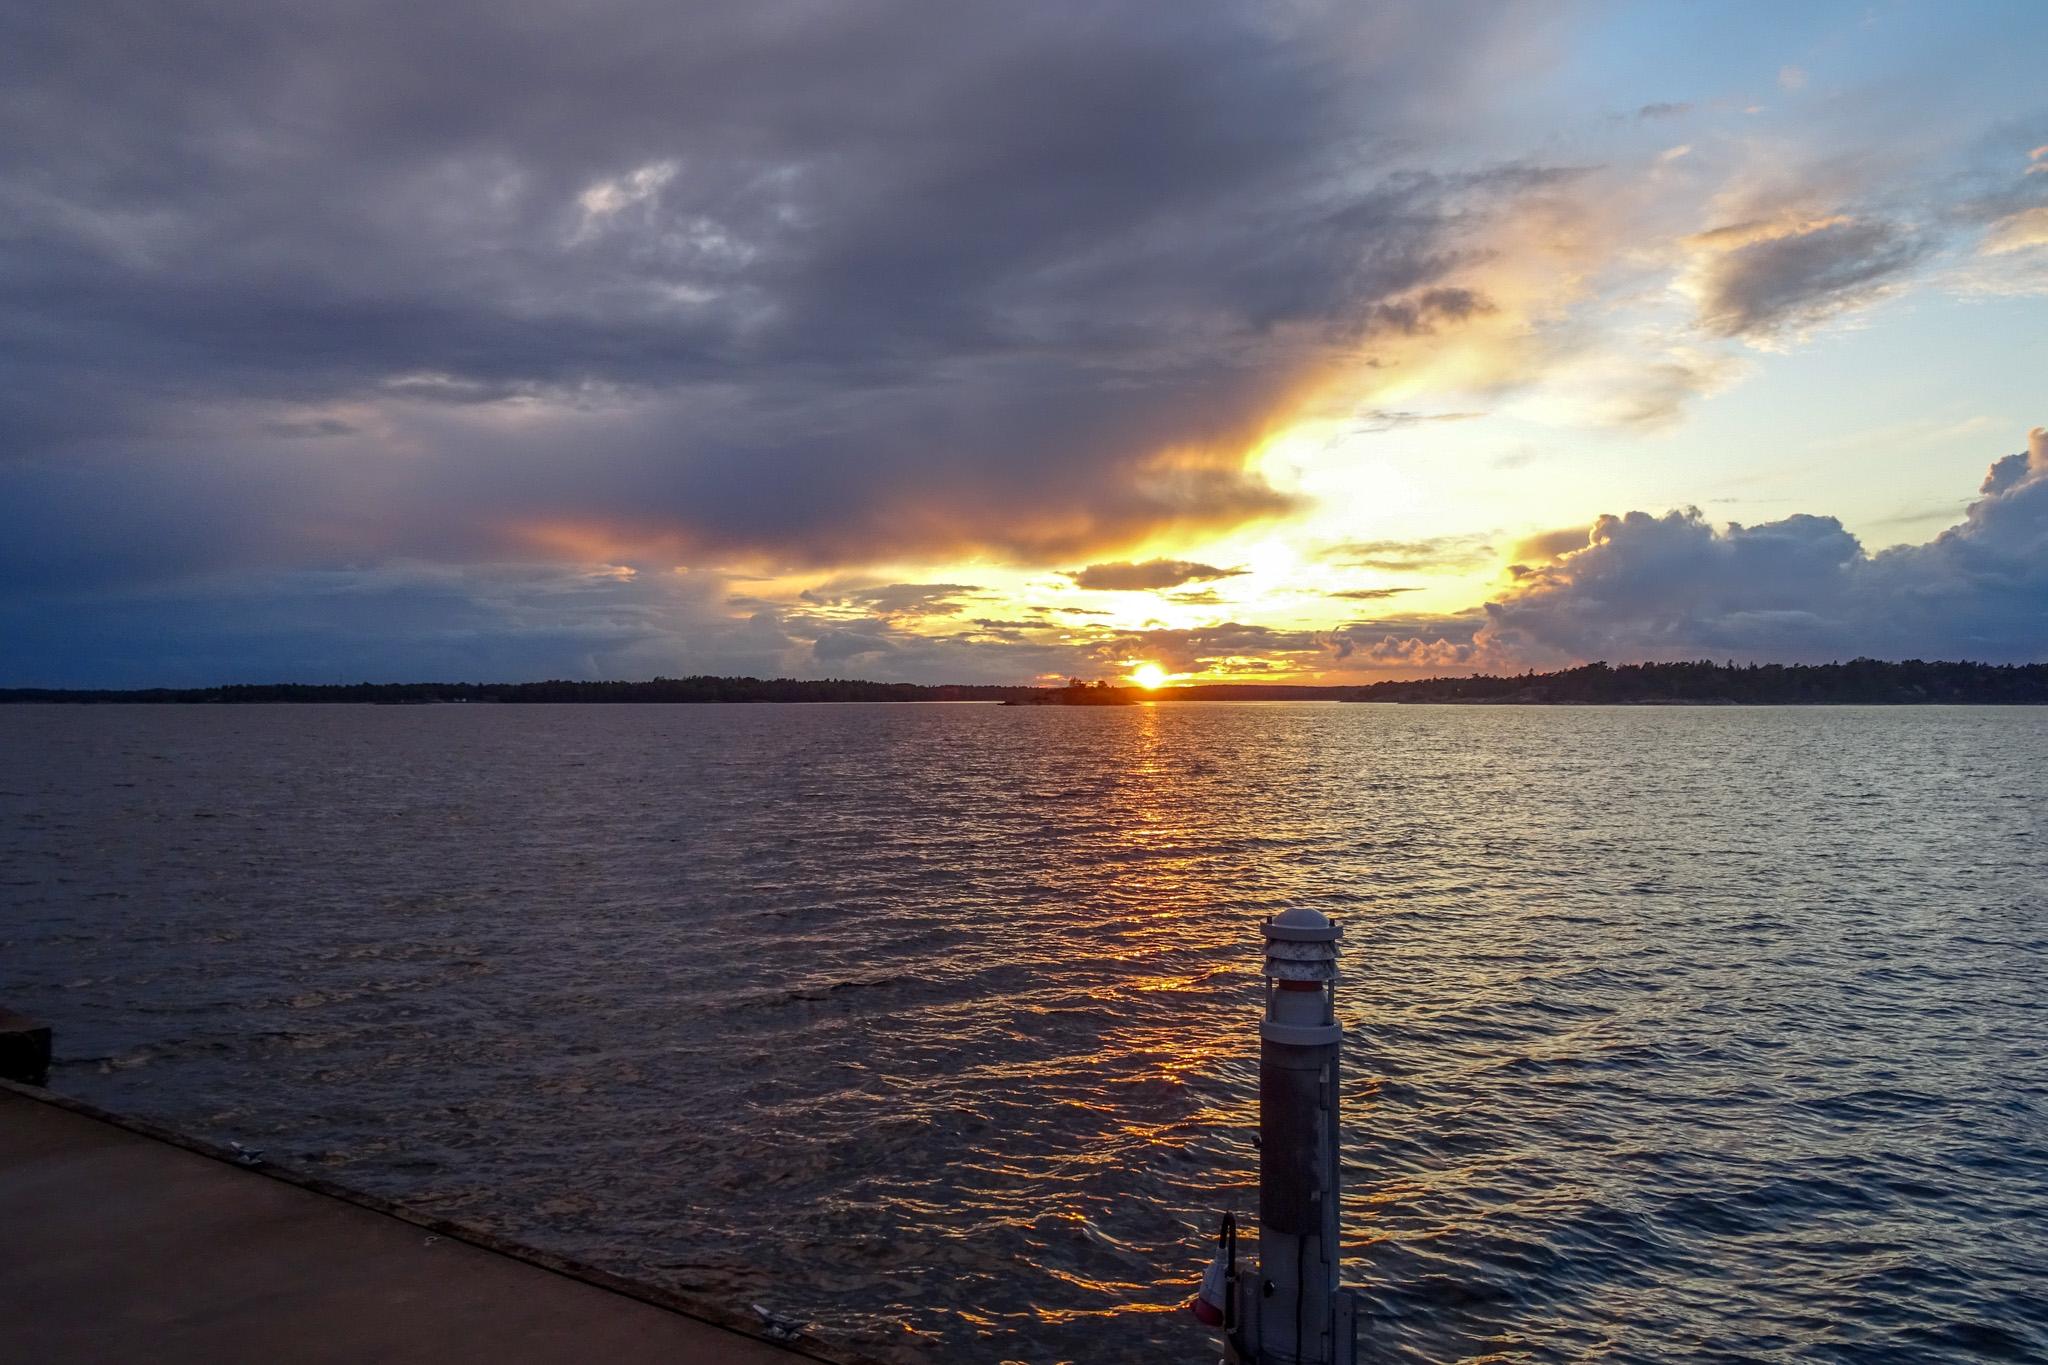 Sonnenuntergang in Idö